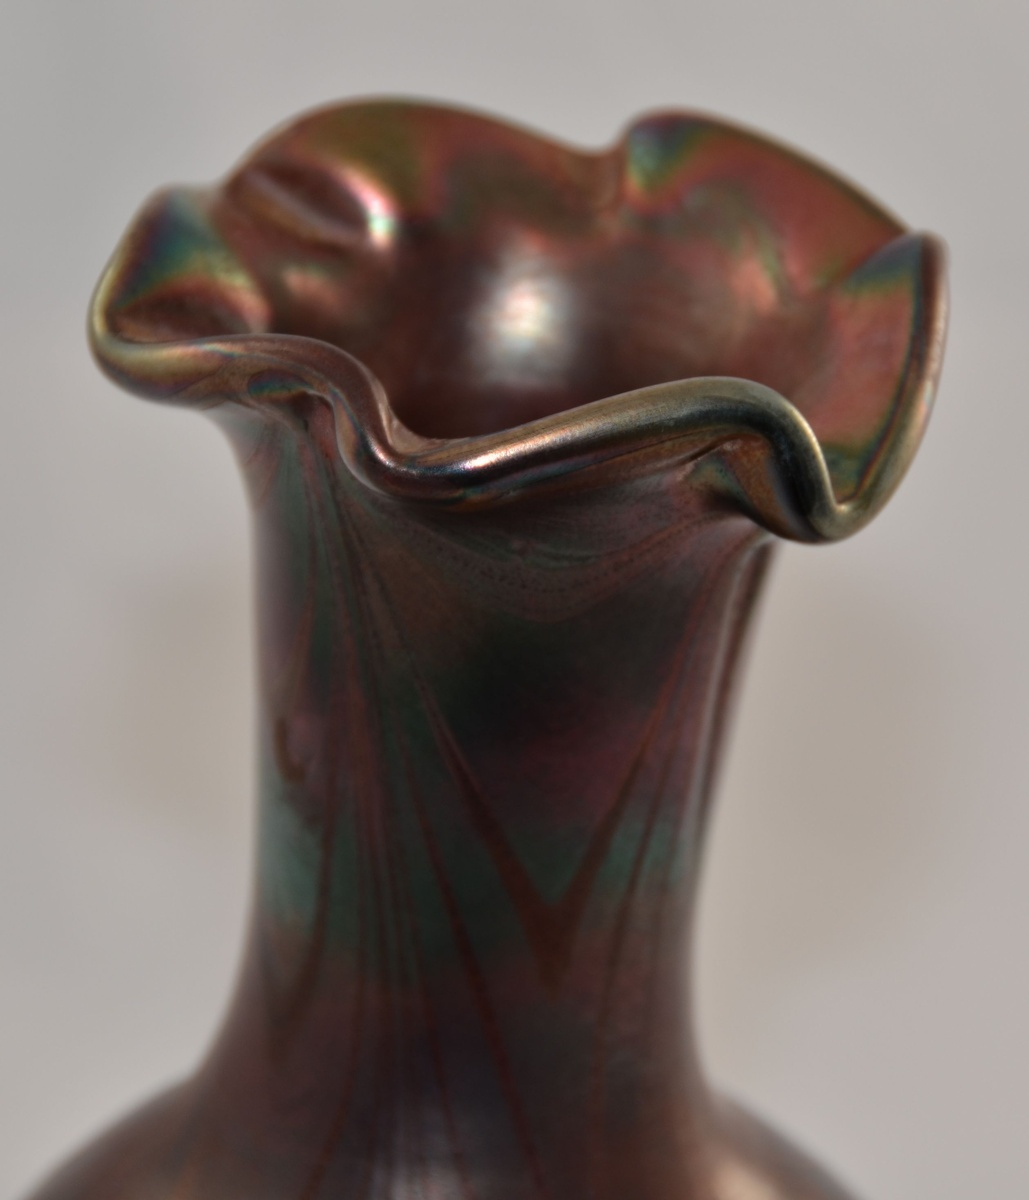 Amethyst Iridescent Art Glass Vase Hand Blown Ruffled Rim ... Irridescent Ruffled Art Glass Vase